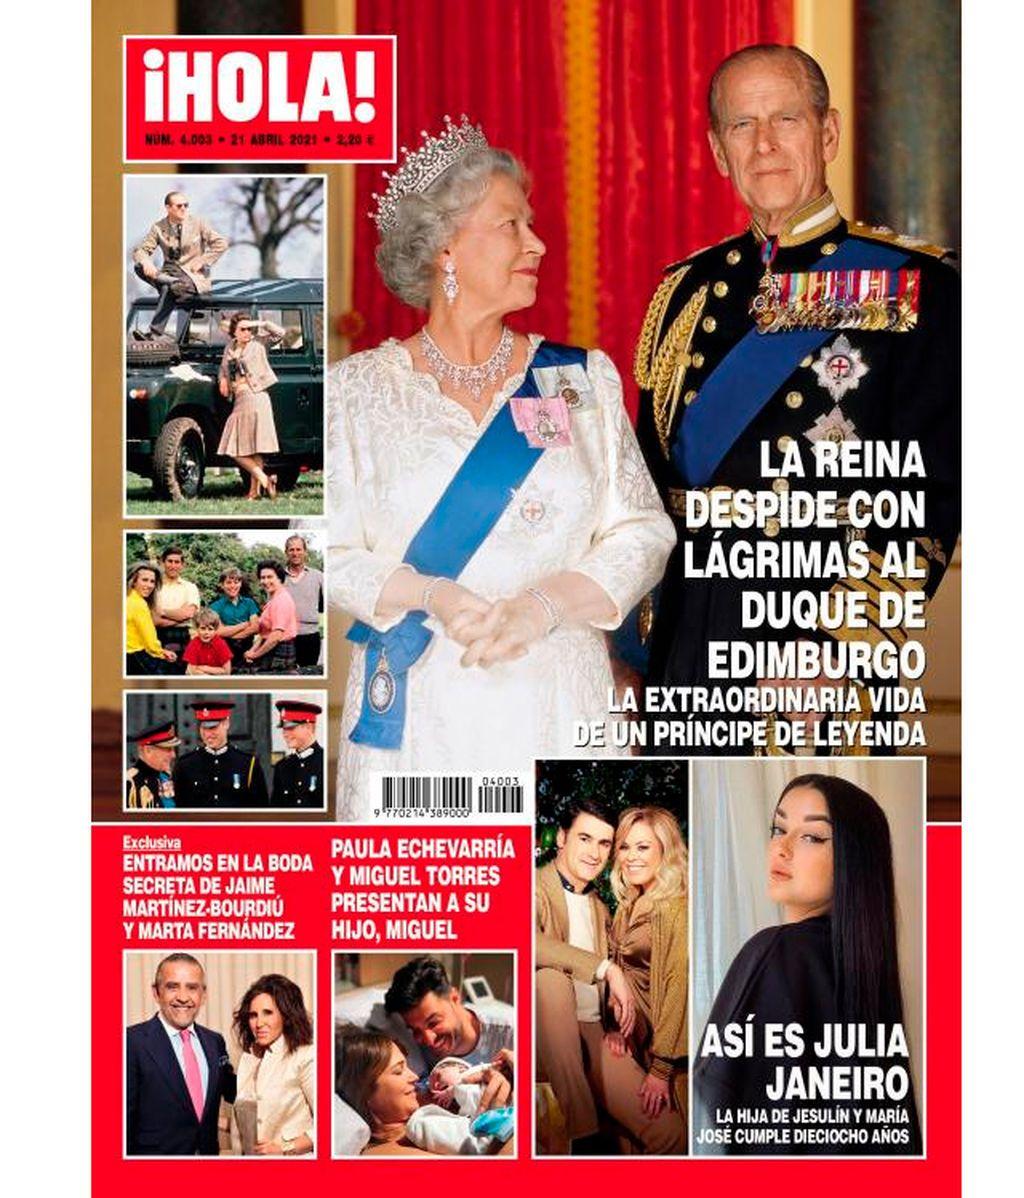 Julia Janeiro en la portada de la revista